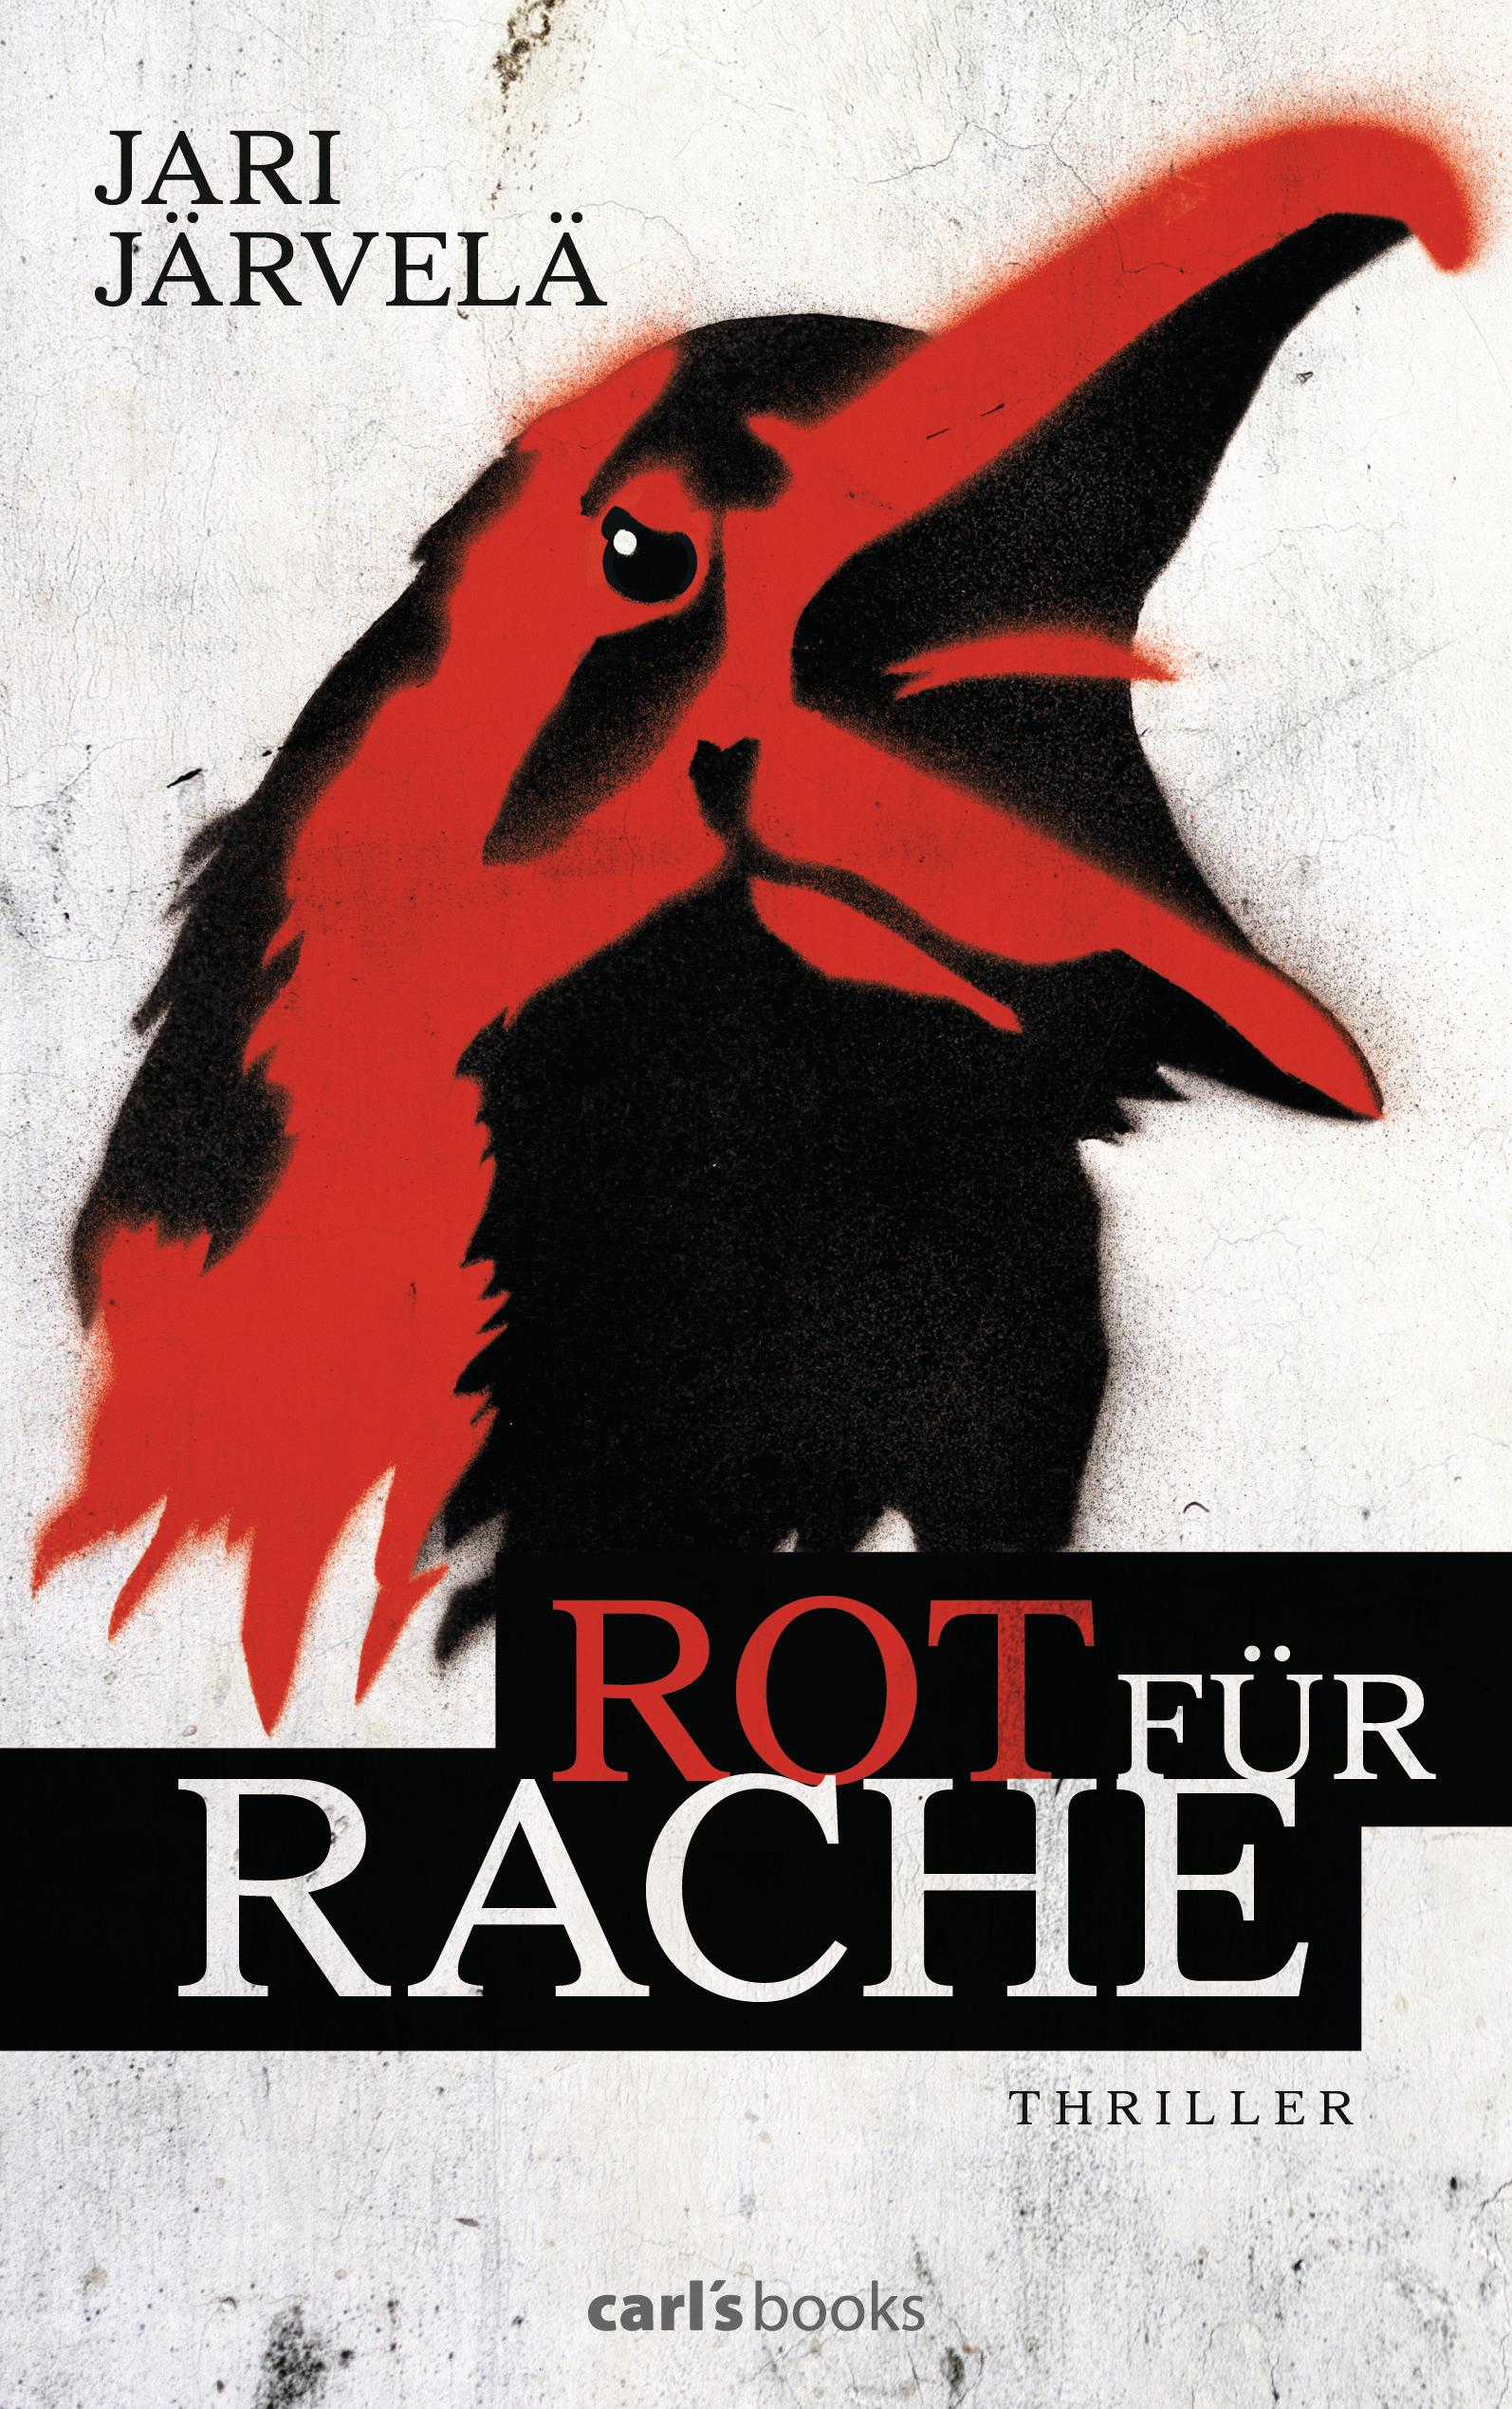 Järvelä_Rot_für_Rache.jpg